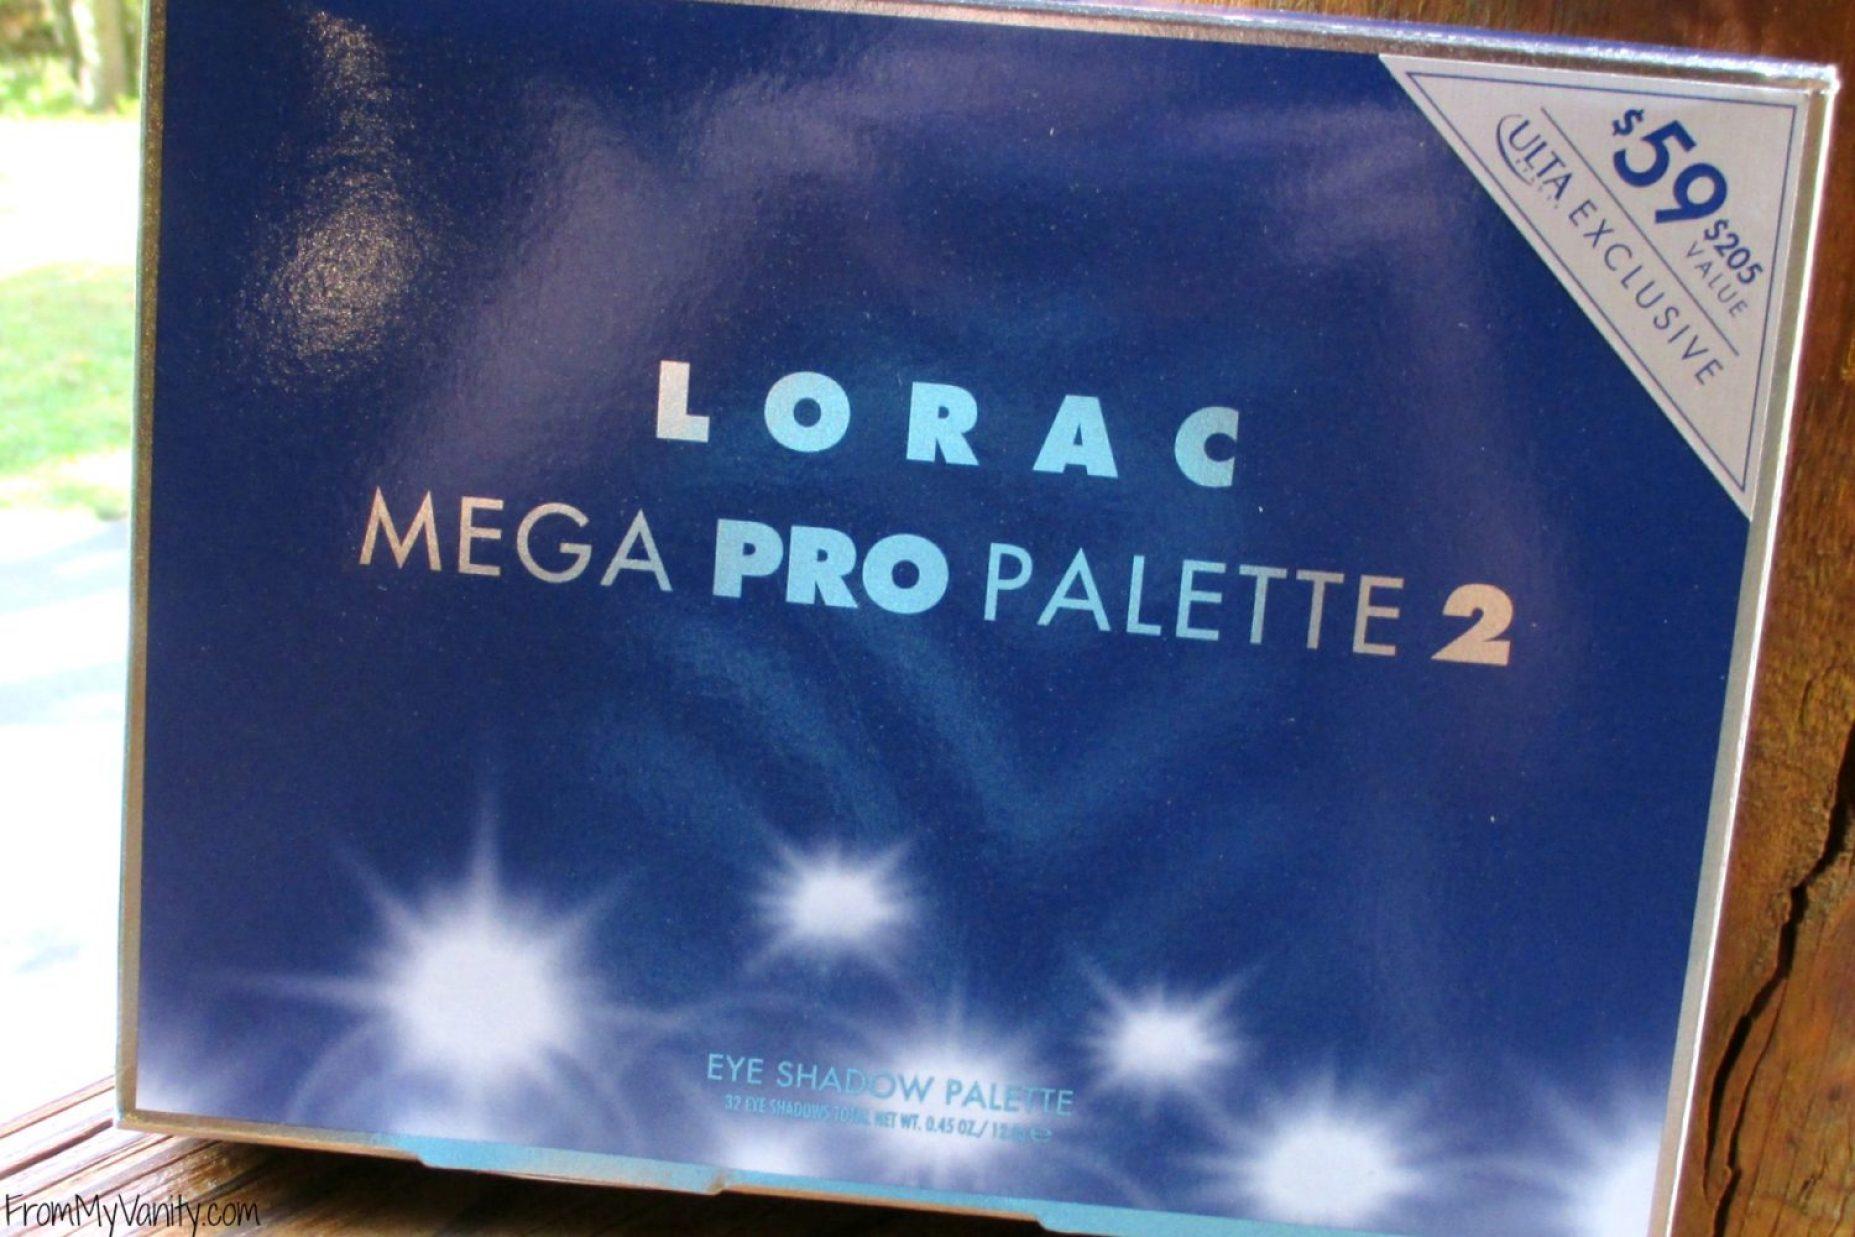 LORAC Mega Pro 2 Eyeshadow Palette // Review, Swatches, & Eye Looks // Packaging // #LORACCosmetics #MegaPro2 FromMyVanity.com